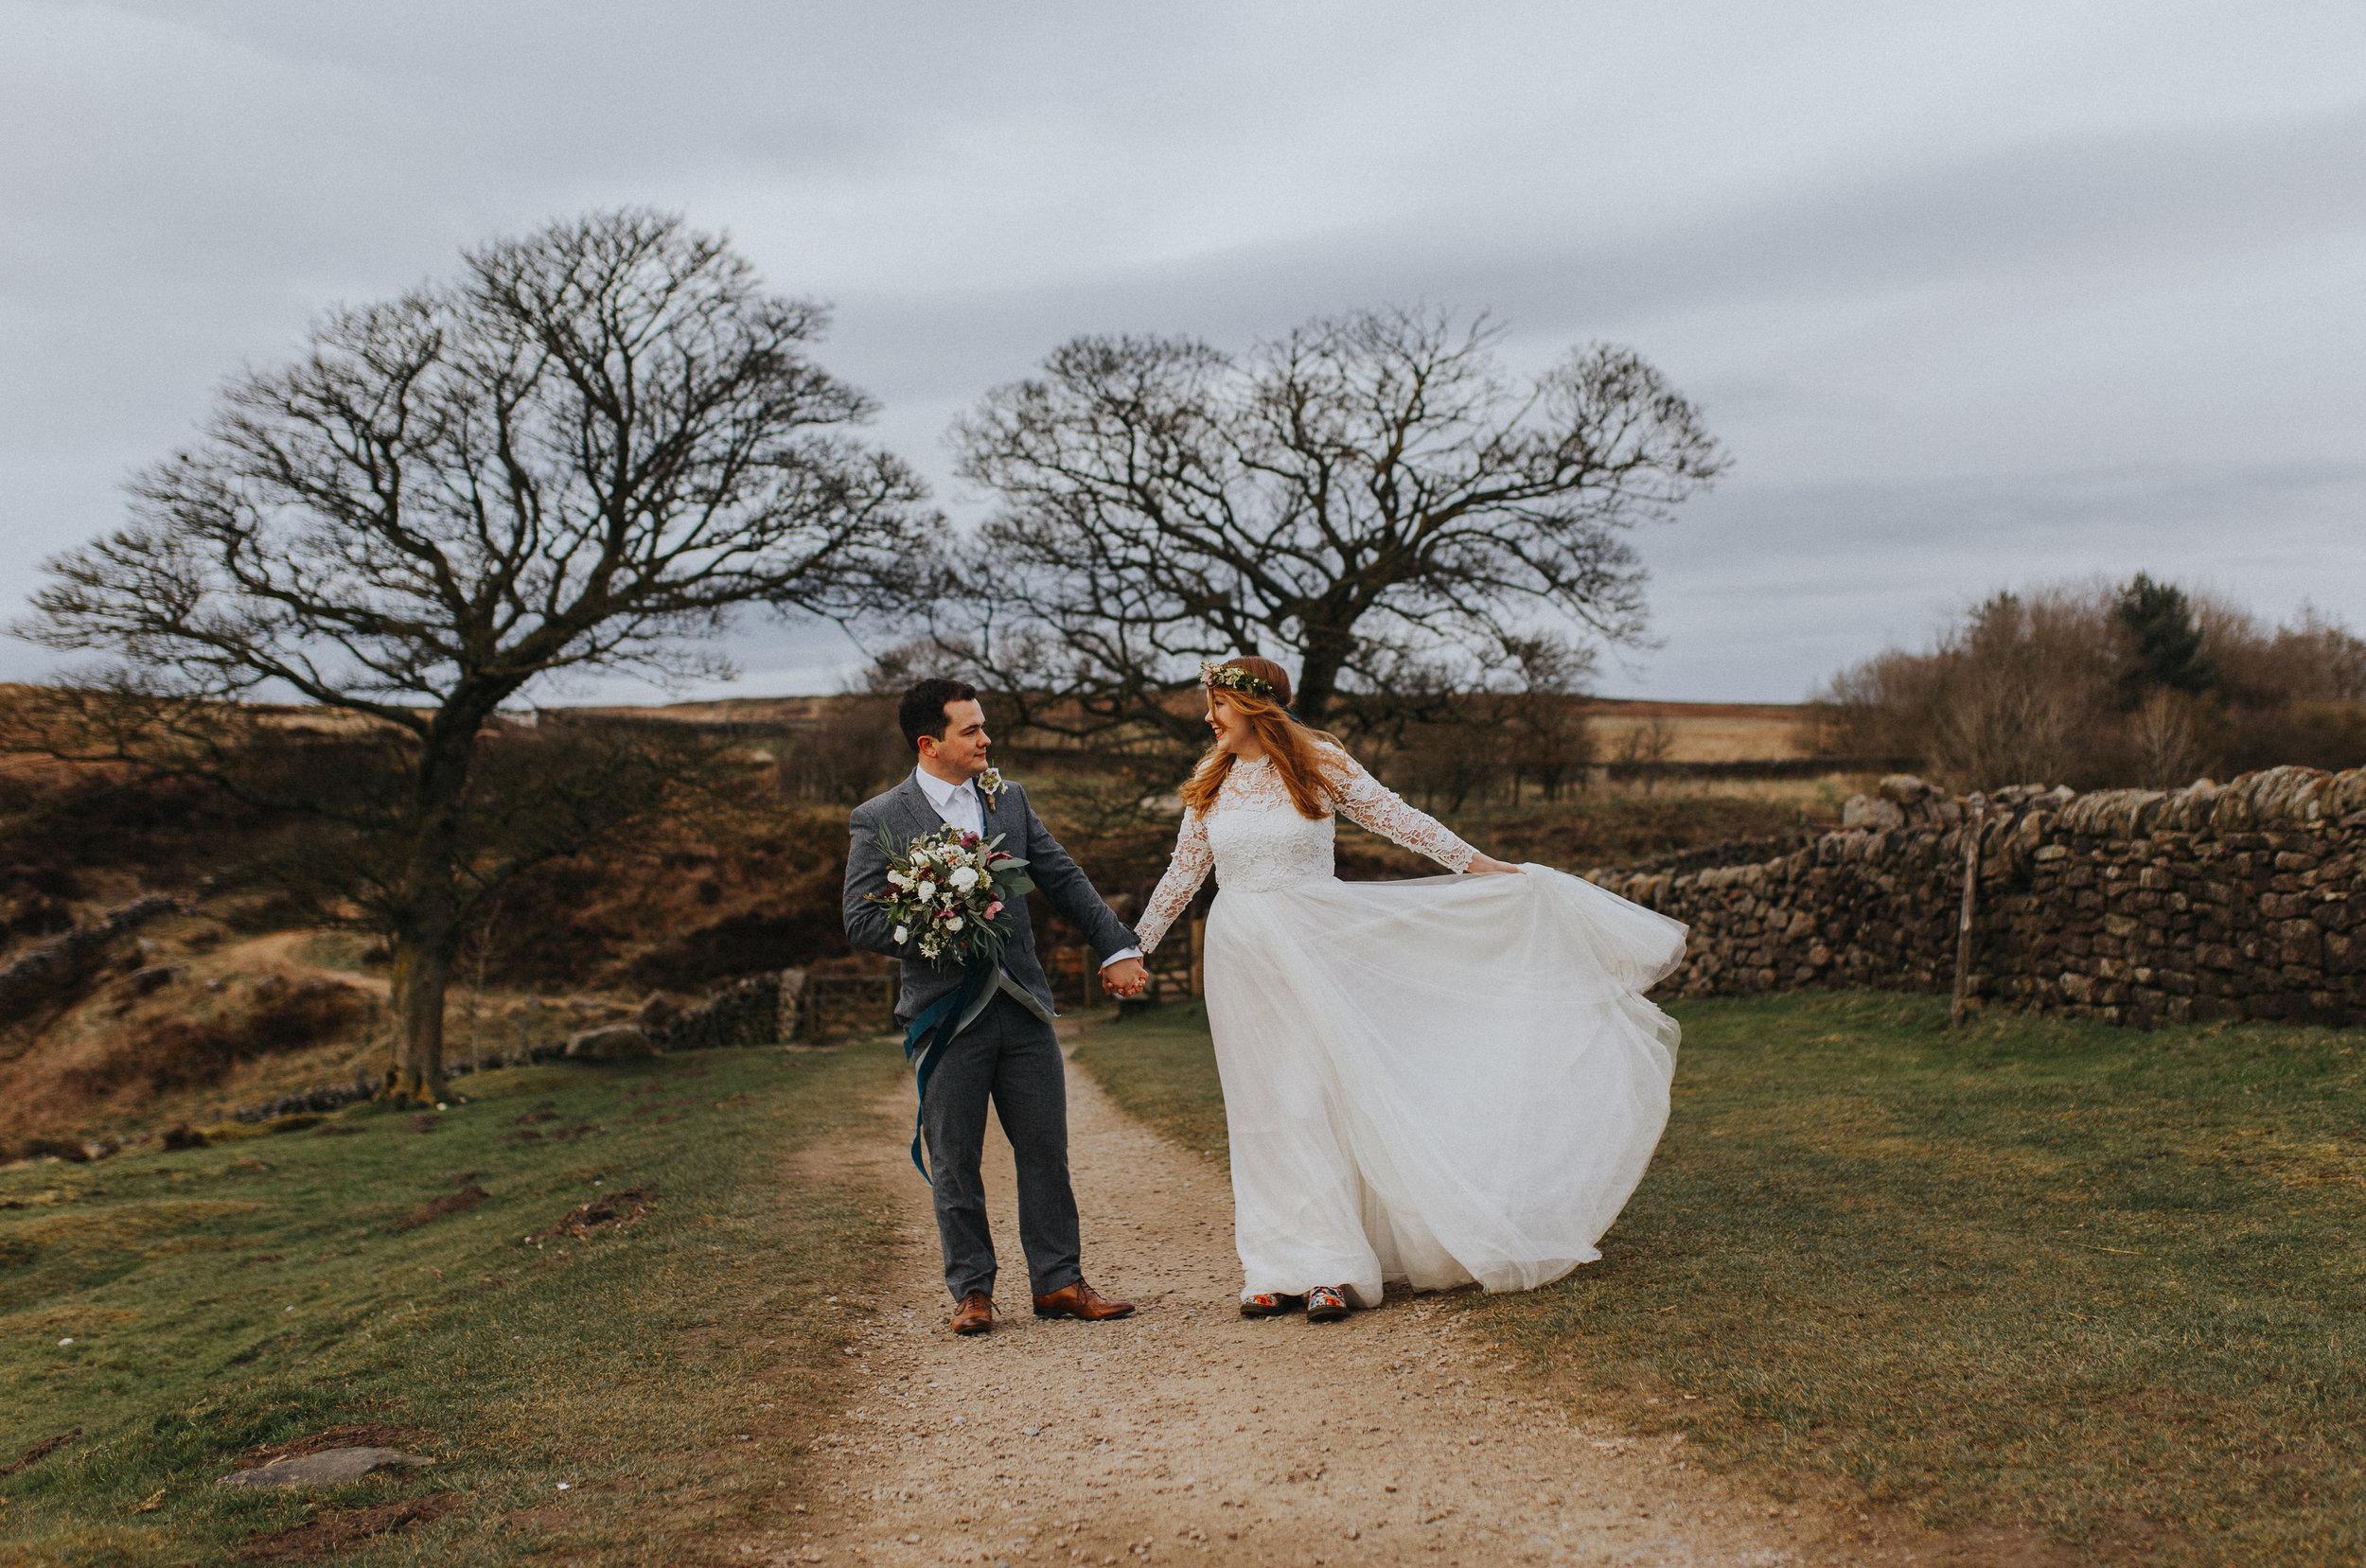 Rosie-bespoke-lace-long sleeved-tulle-wedding-dress-winter-peak district-susanna greening-5.jpg